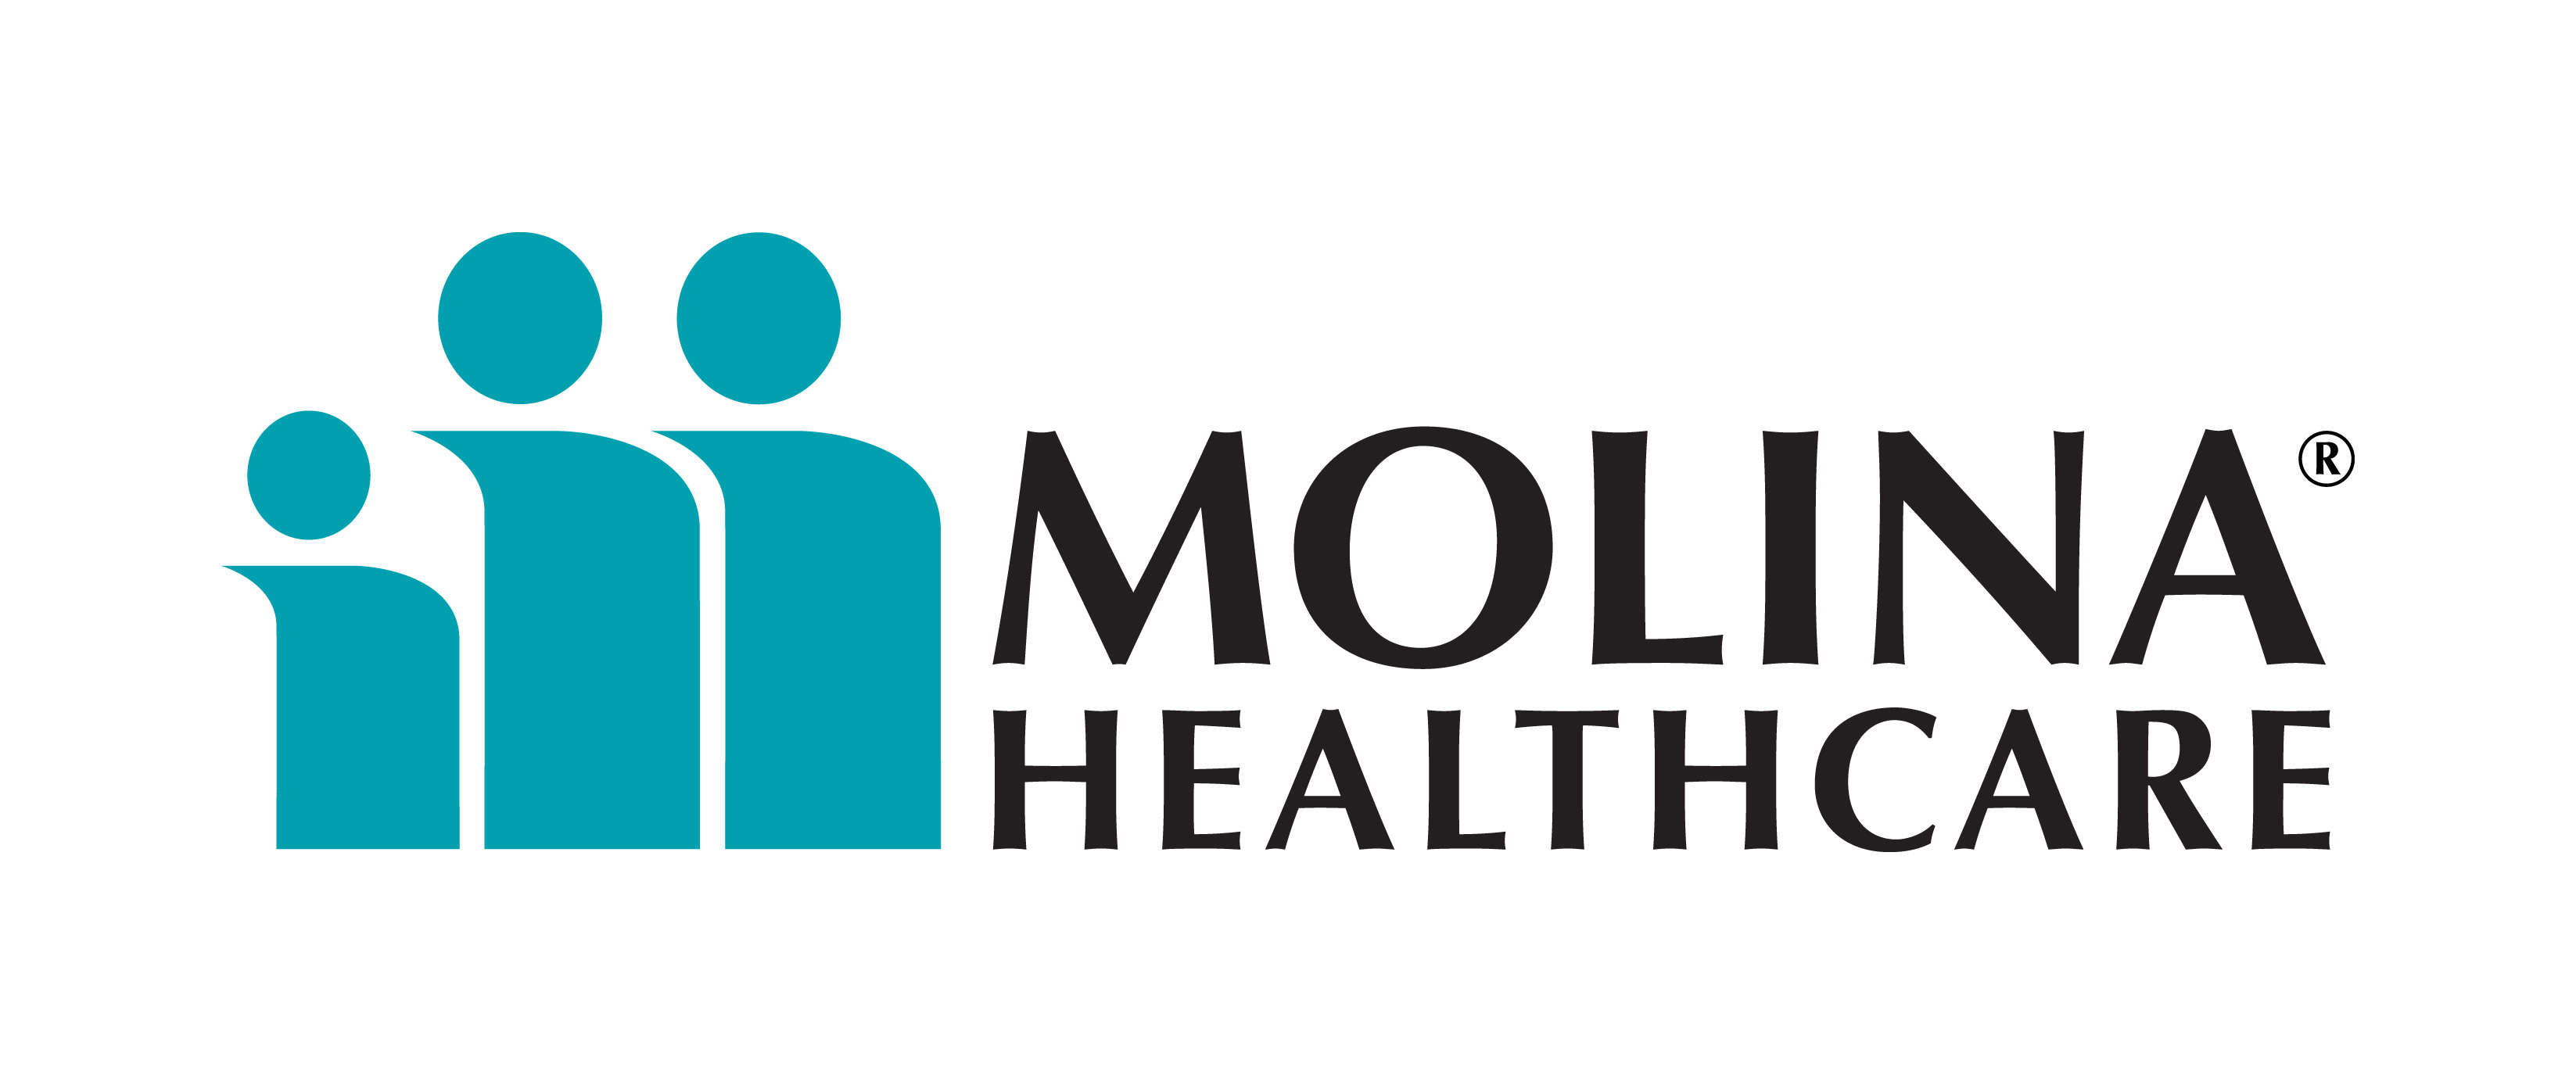 006_-__Molina_Healthcare_Logo_STD-PMS320-JPG.jpg